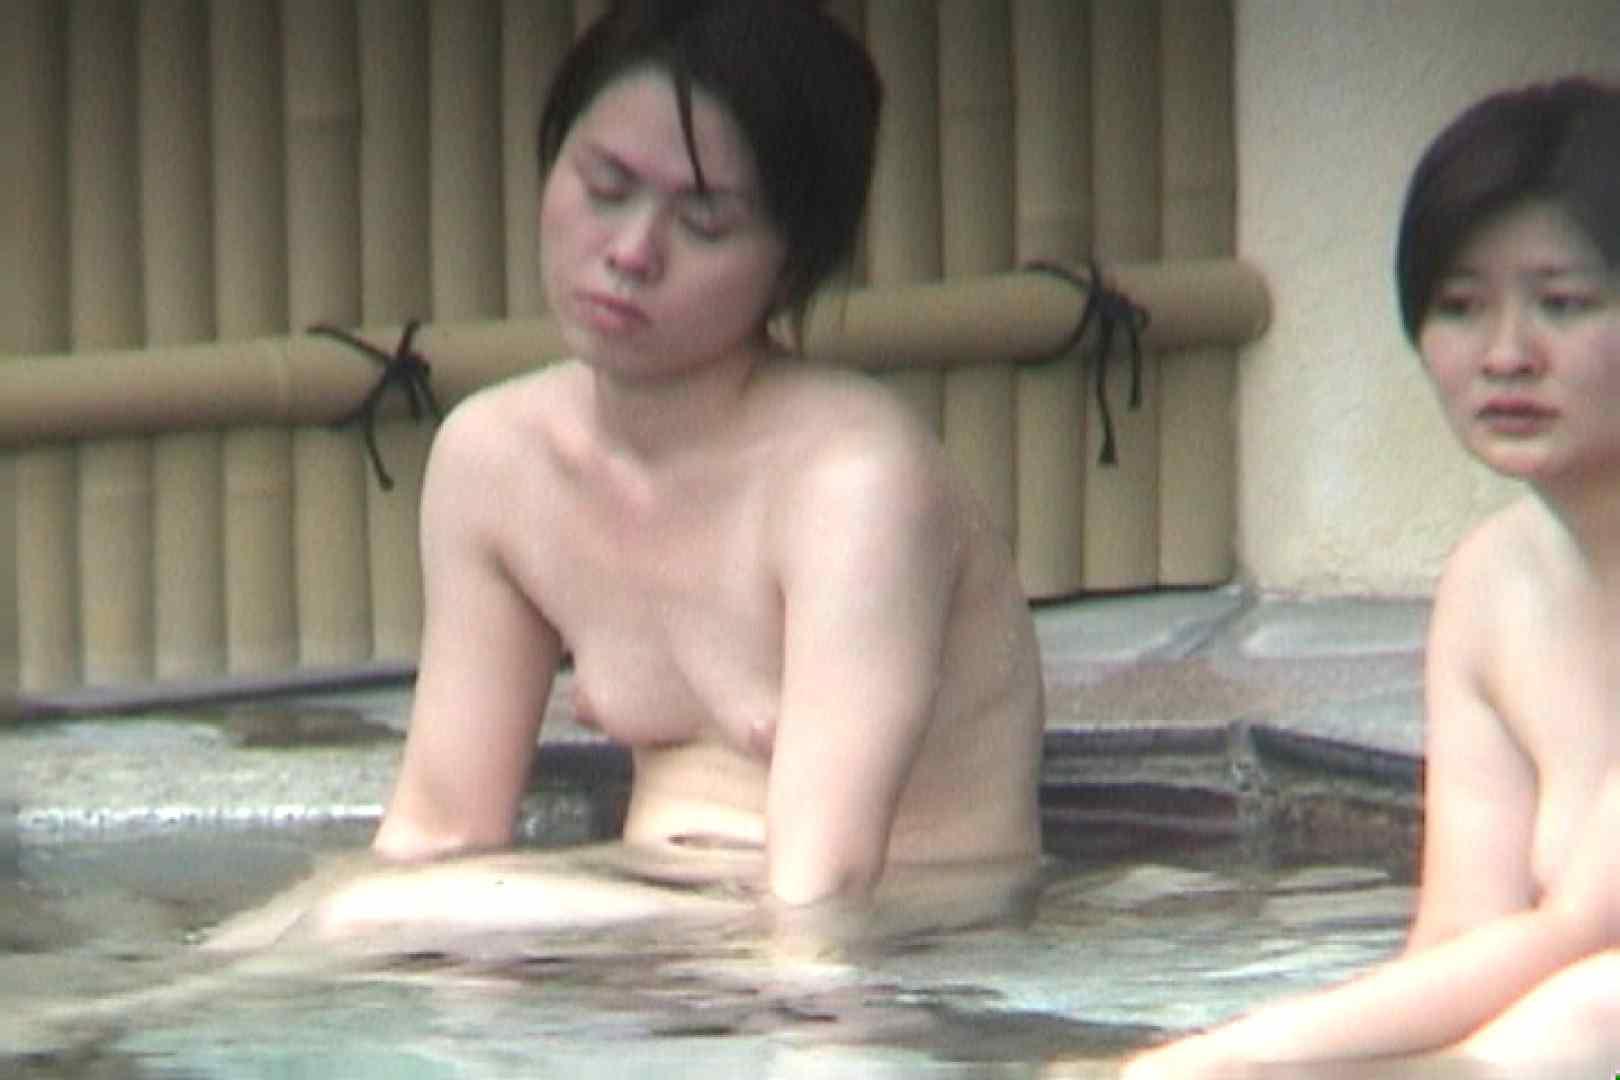 Aquaな露天風呂Vol.558 盗撮師作品  86pic 42